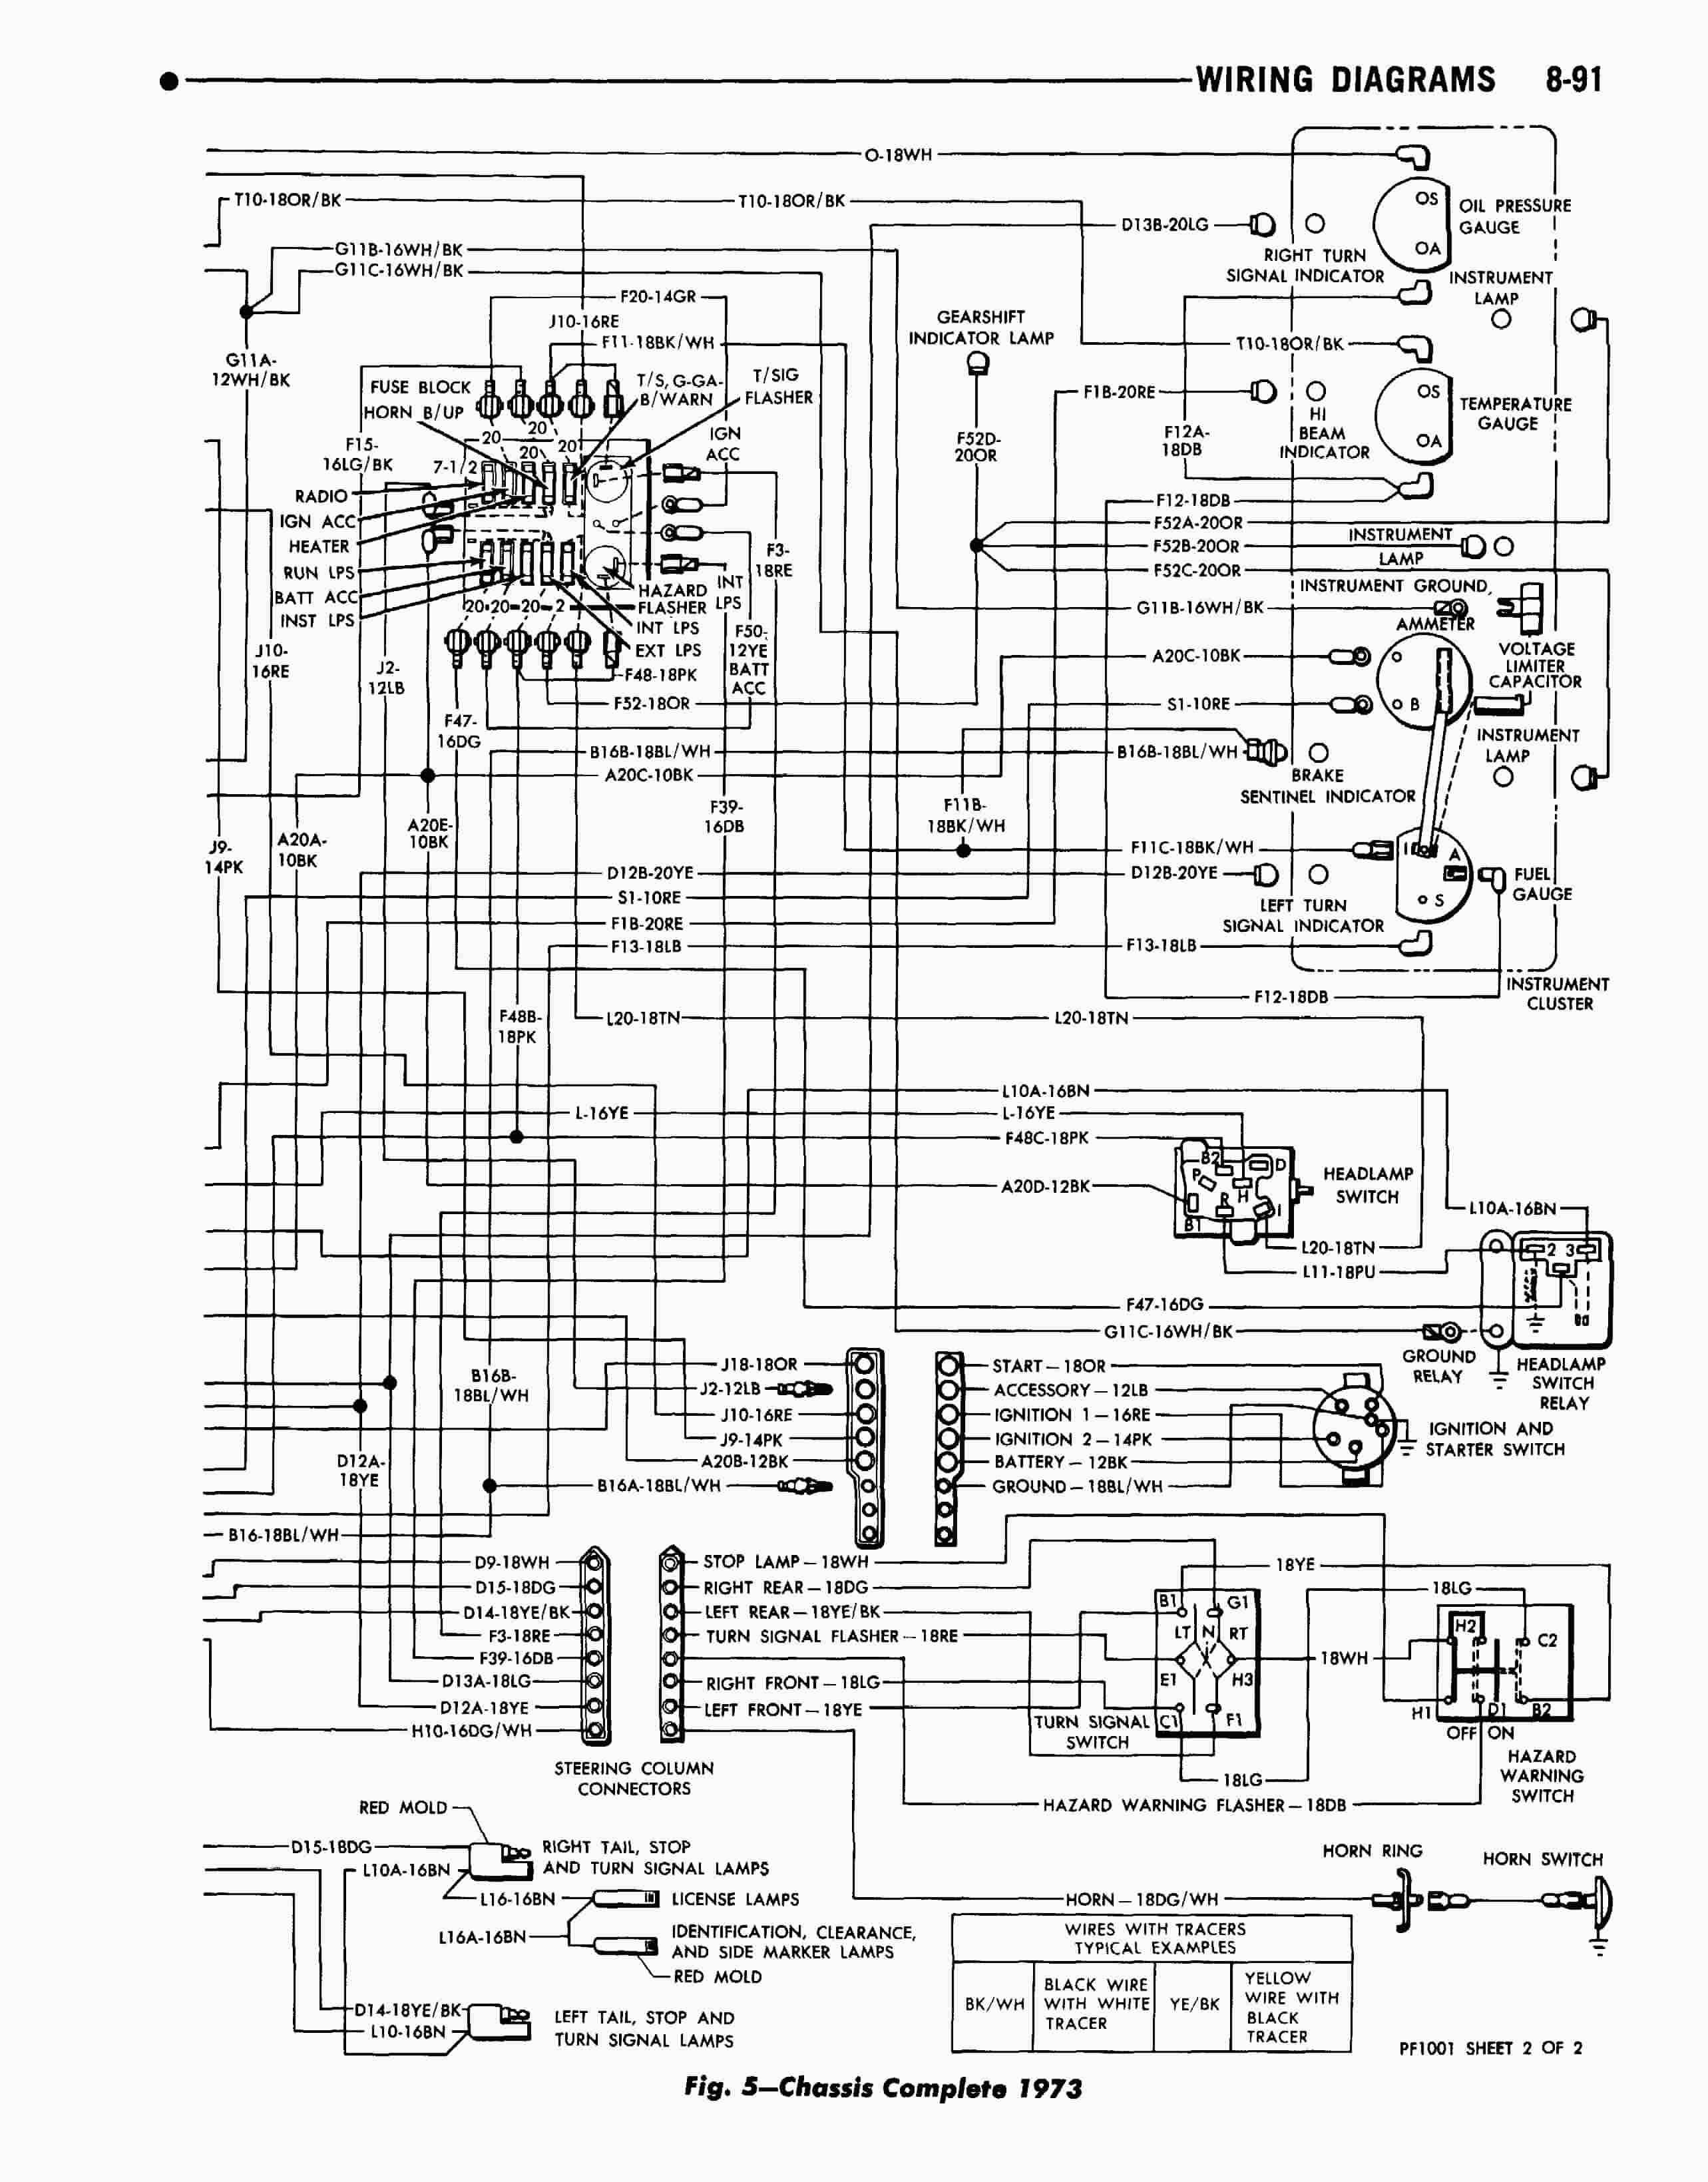 cougar rv wiring diagrams wiring diagram schematicskeystone rv wiring wiring diagram database keystone rv wiring diagrams cougar rv wiring diagrams